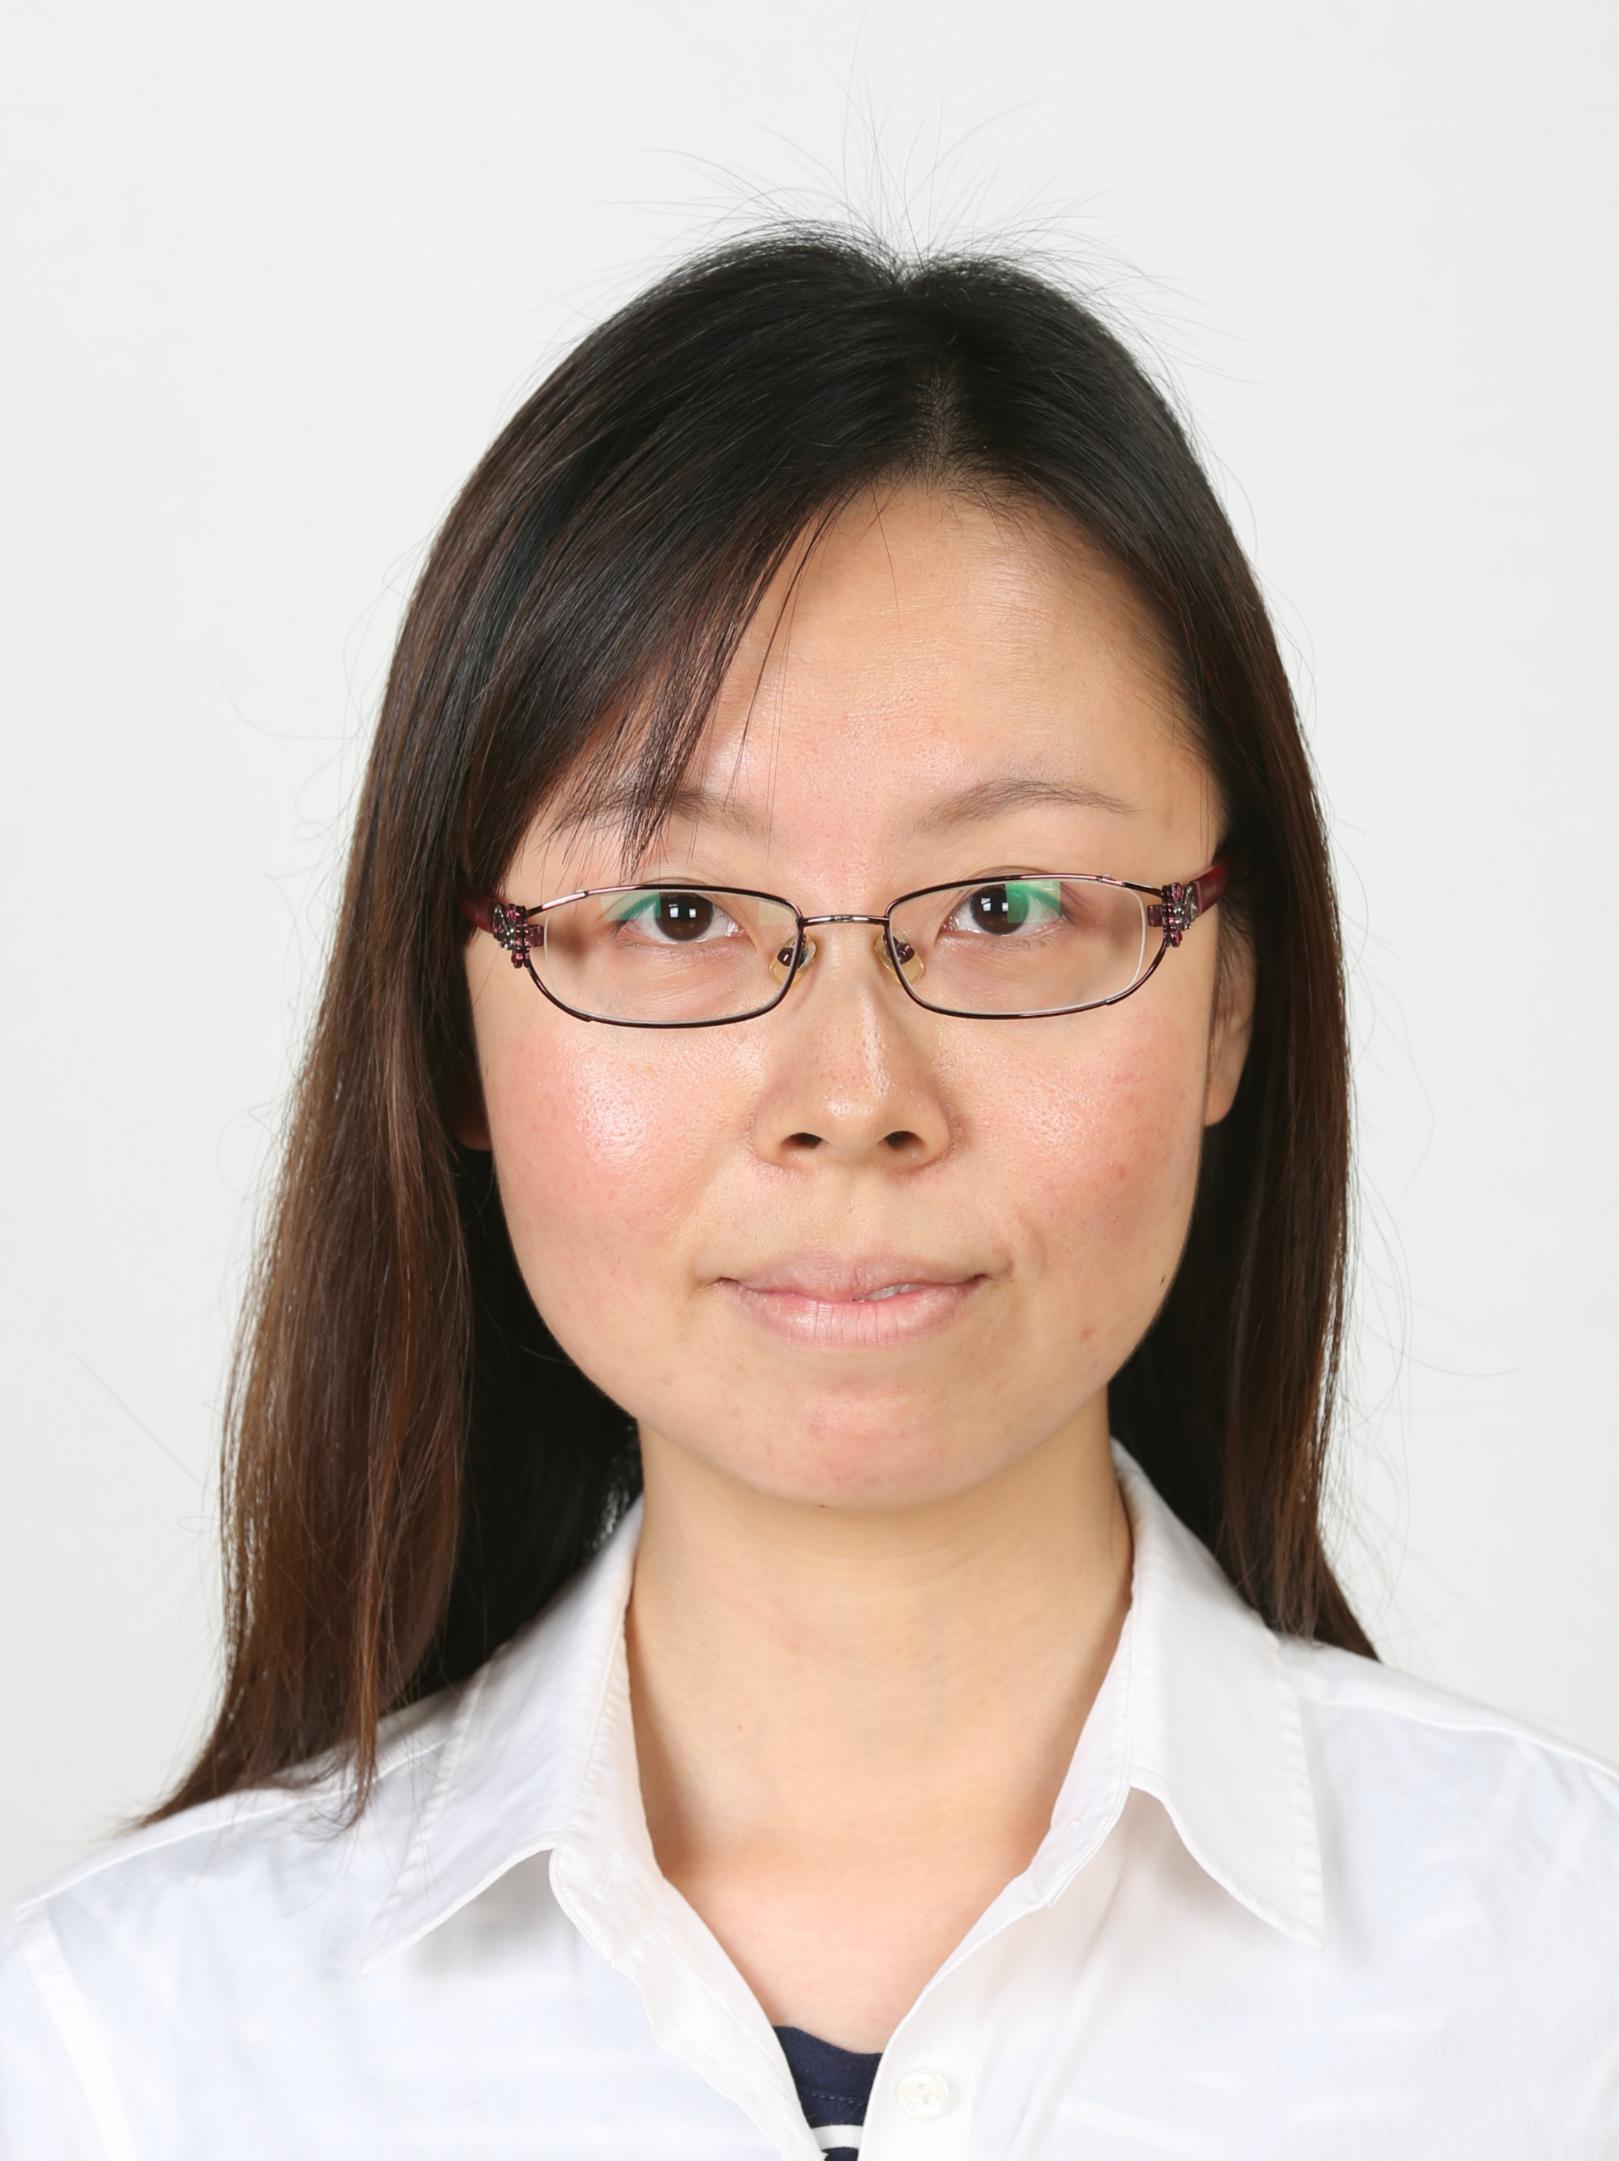 Lily Xue